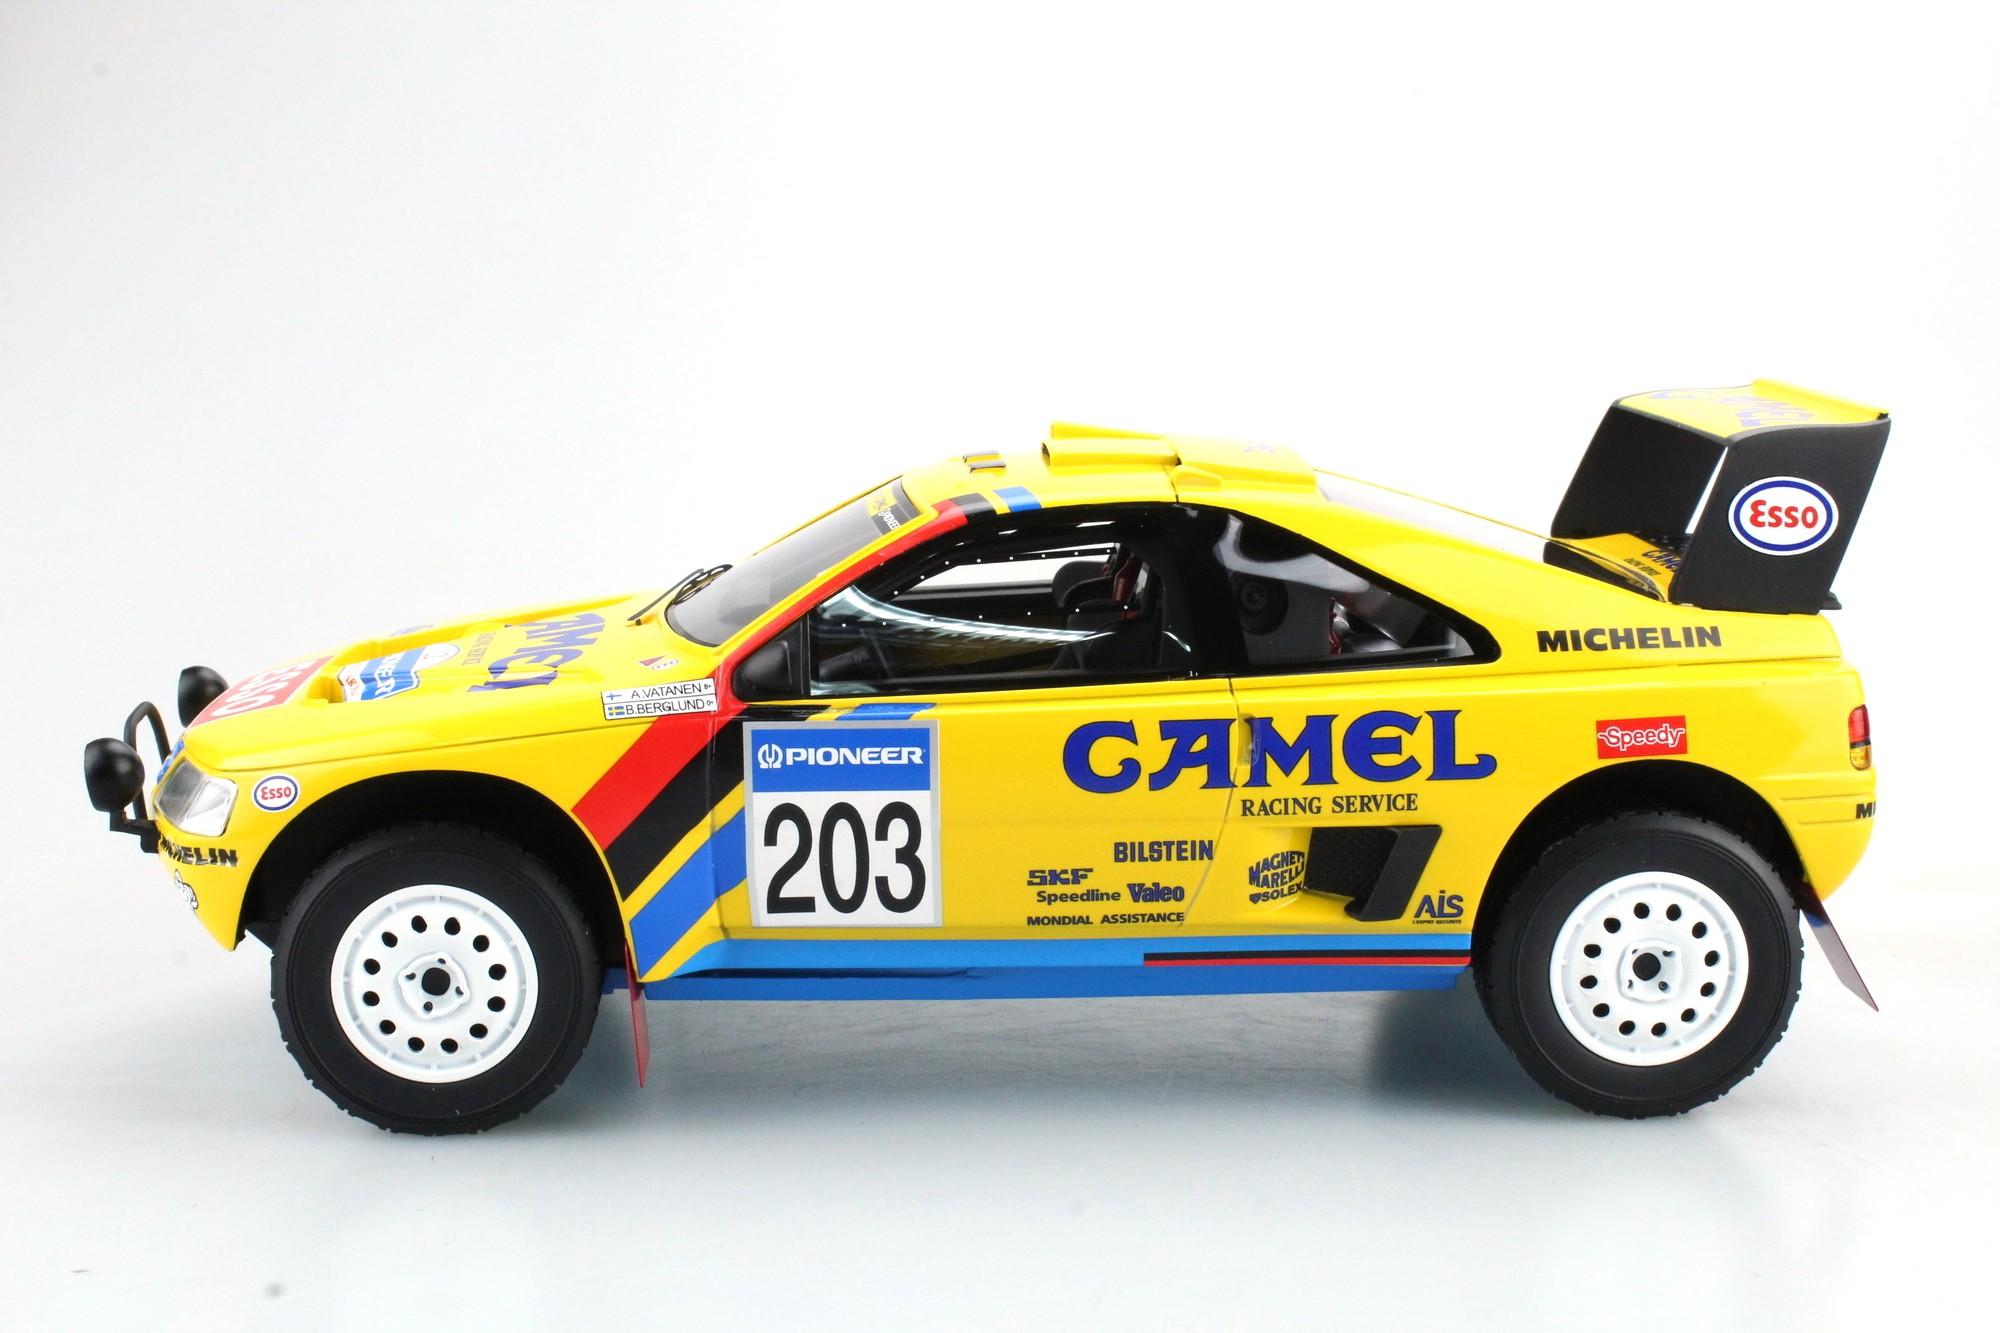 Top Marques Collectibles Peugeot 405 GT T 16 Paris Dakar Winner 1990